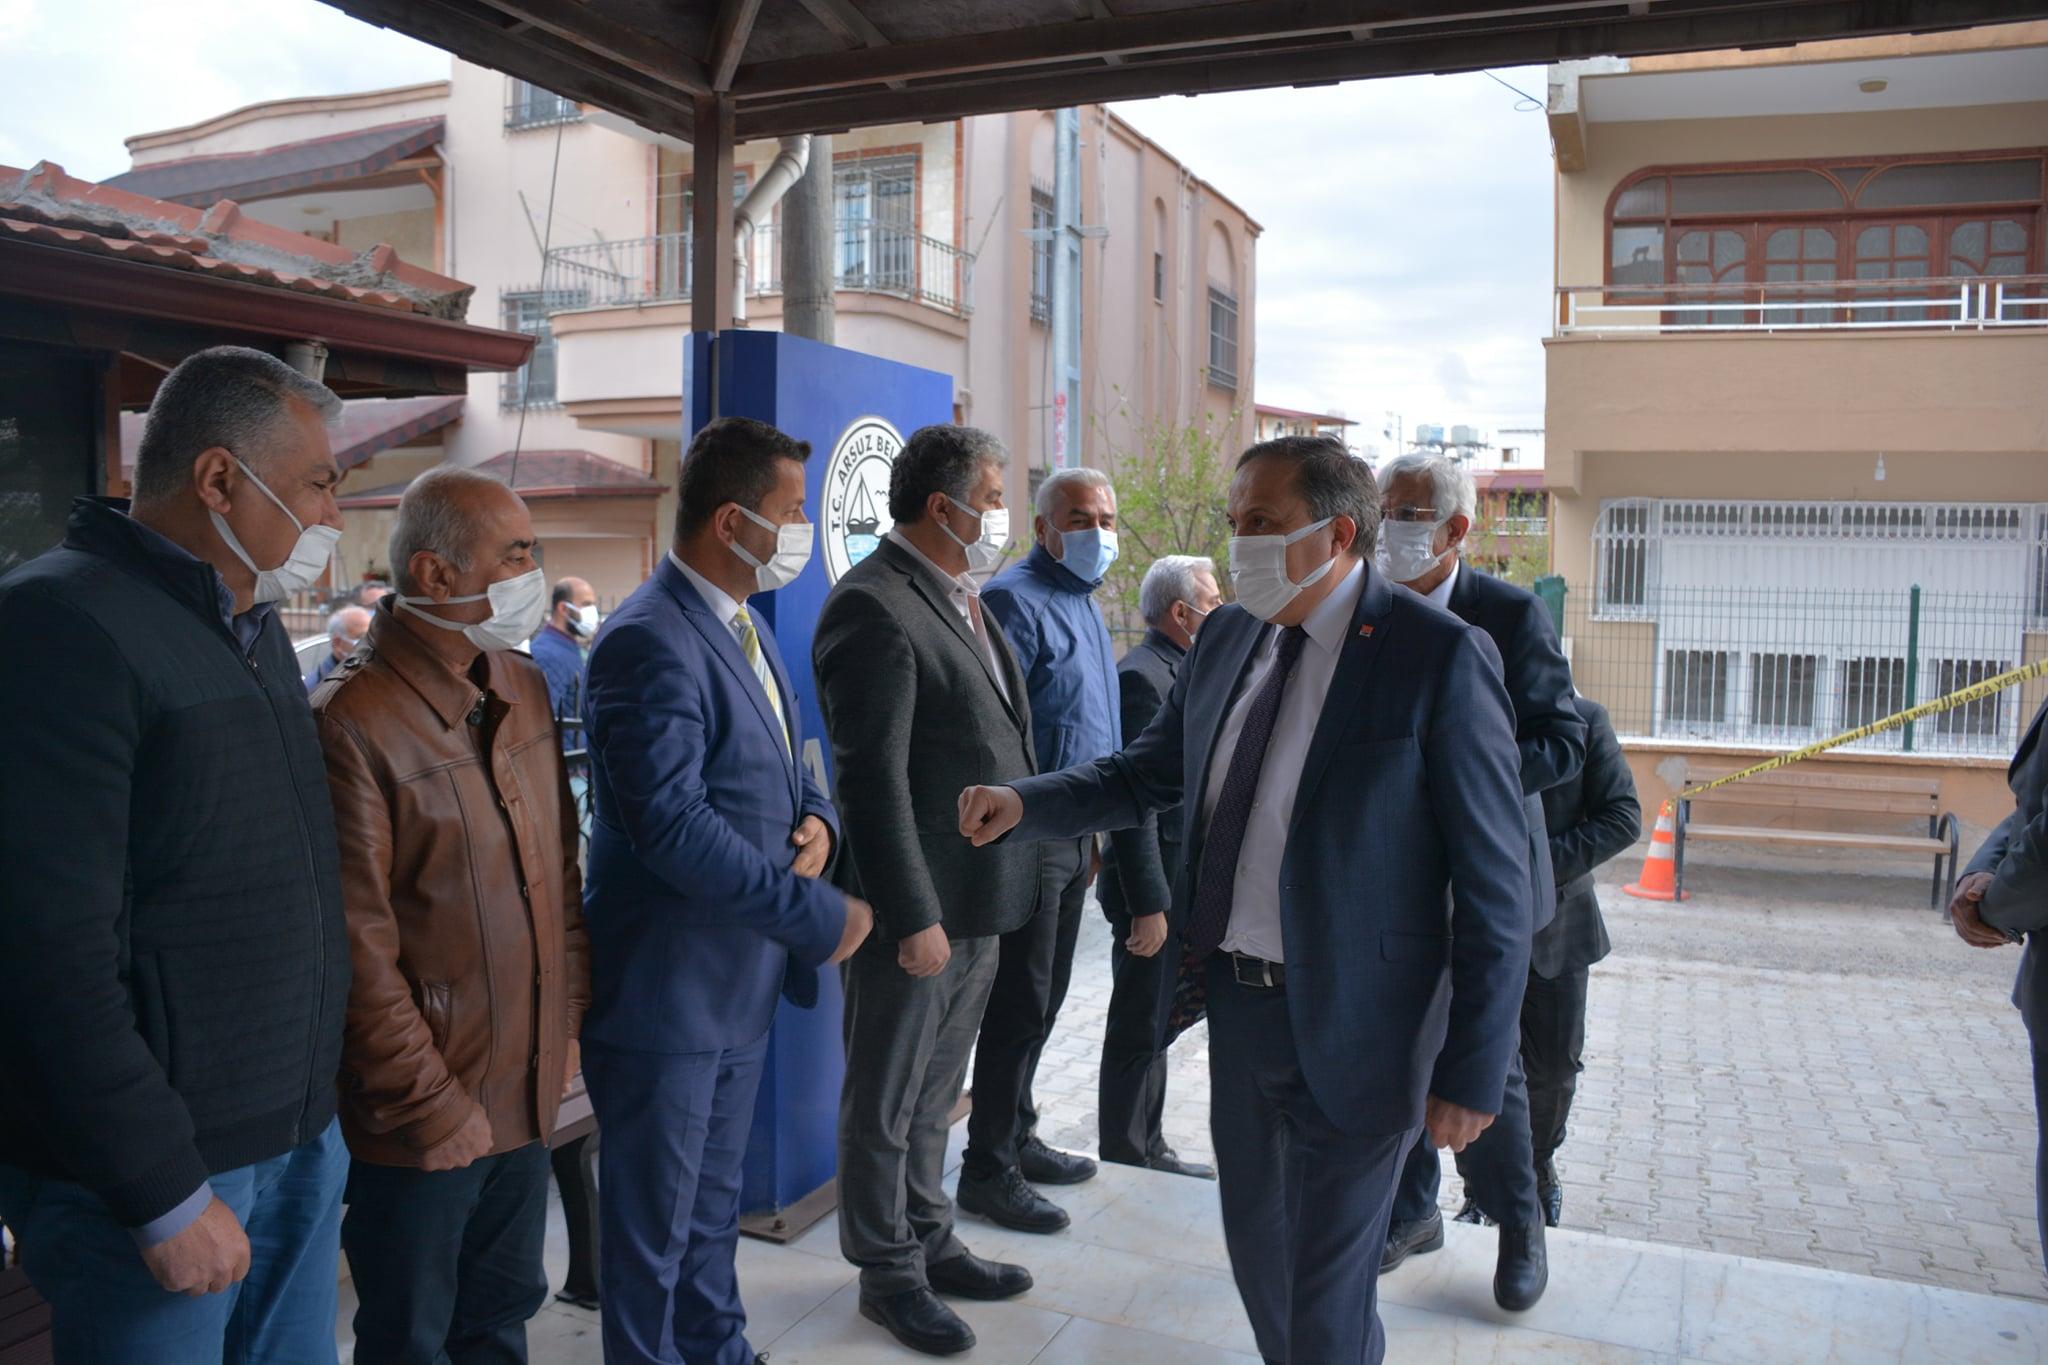 CHP GENEL BAŞKAN YARDIMCISI SEYİT TORUN ARSUZ'DA